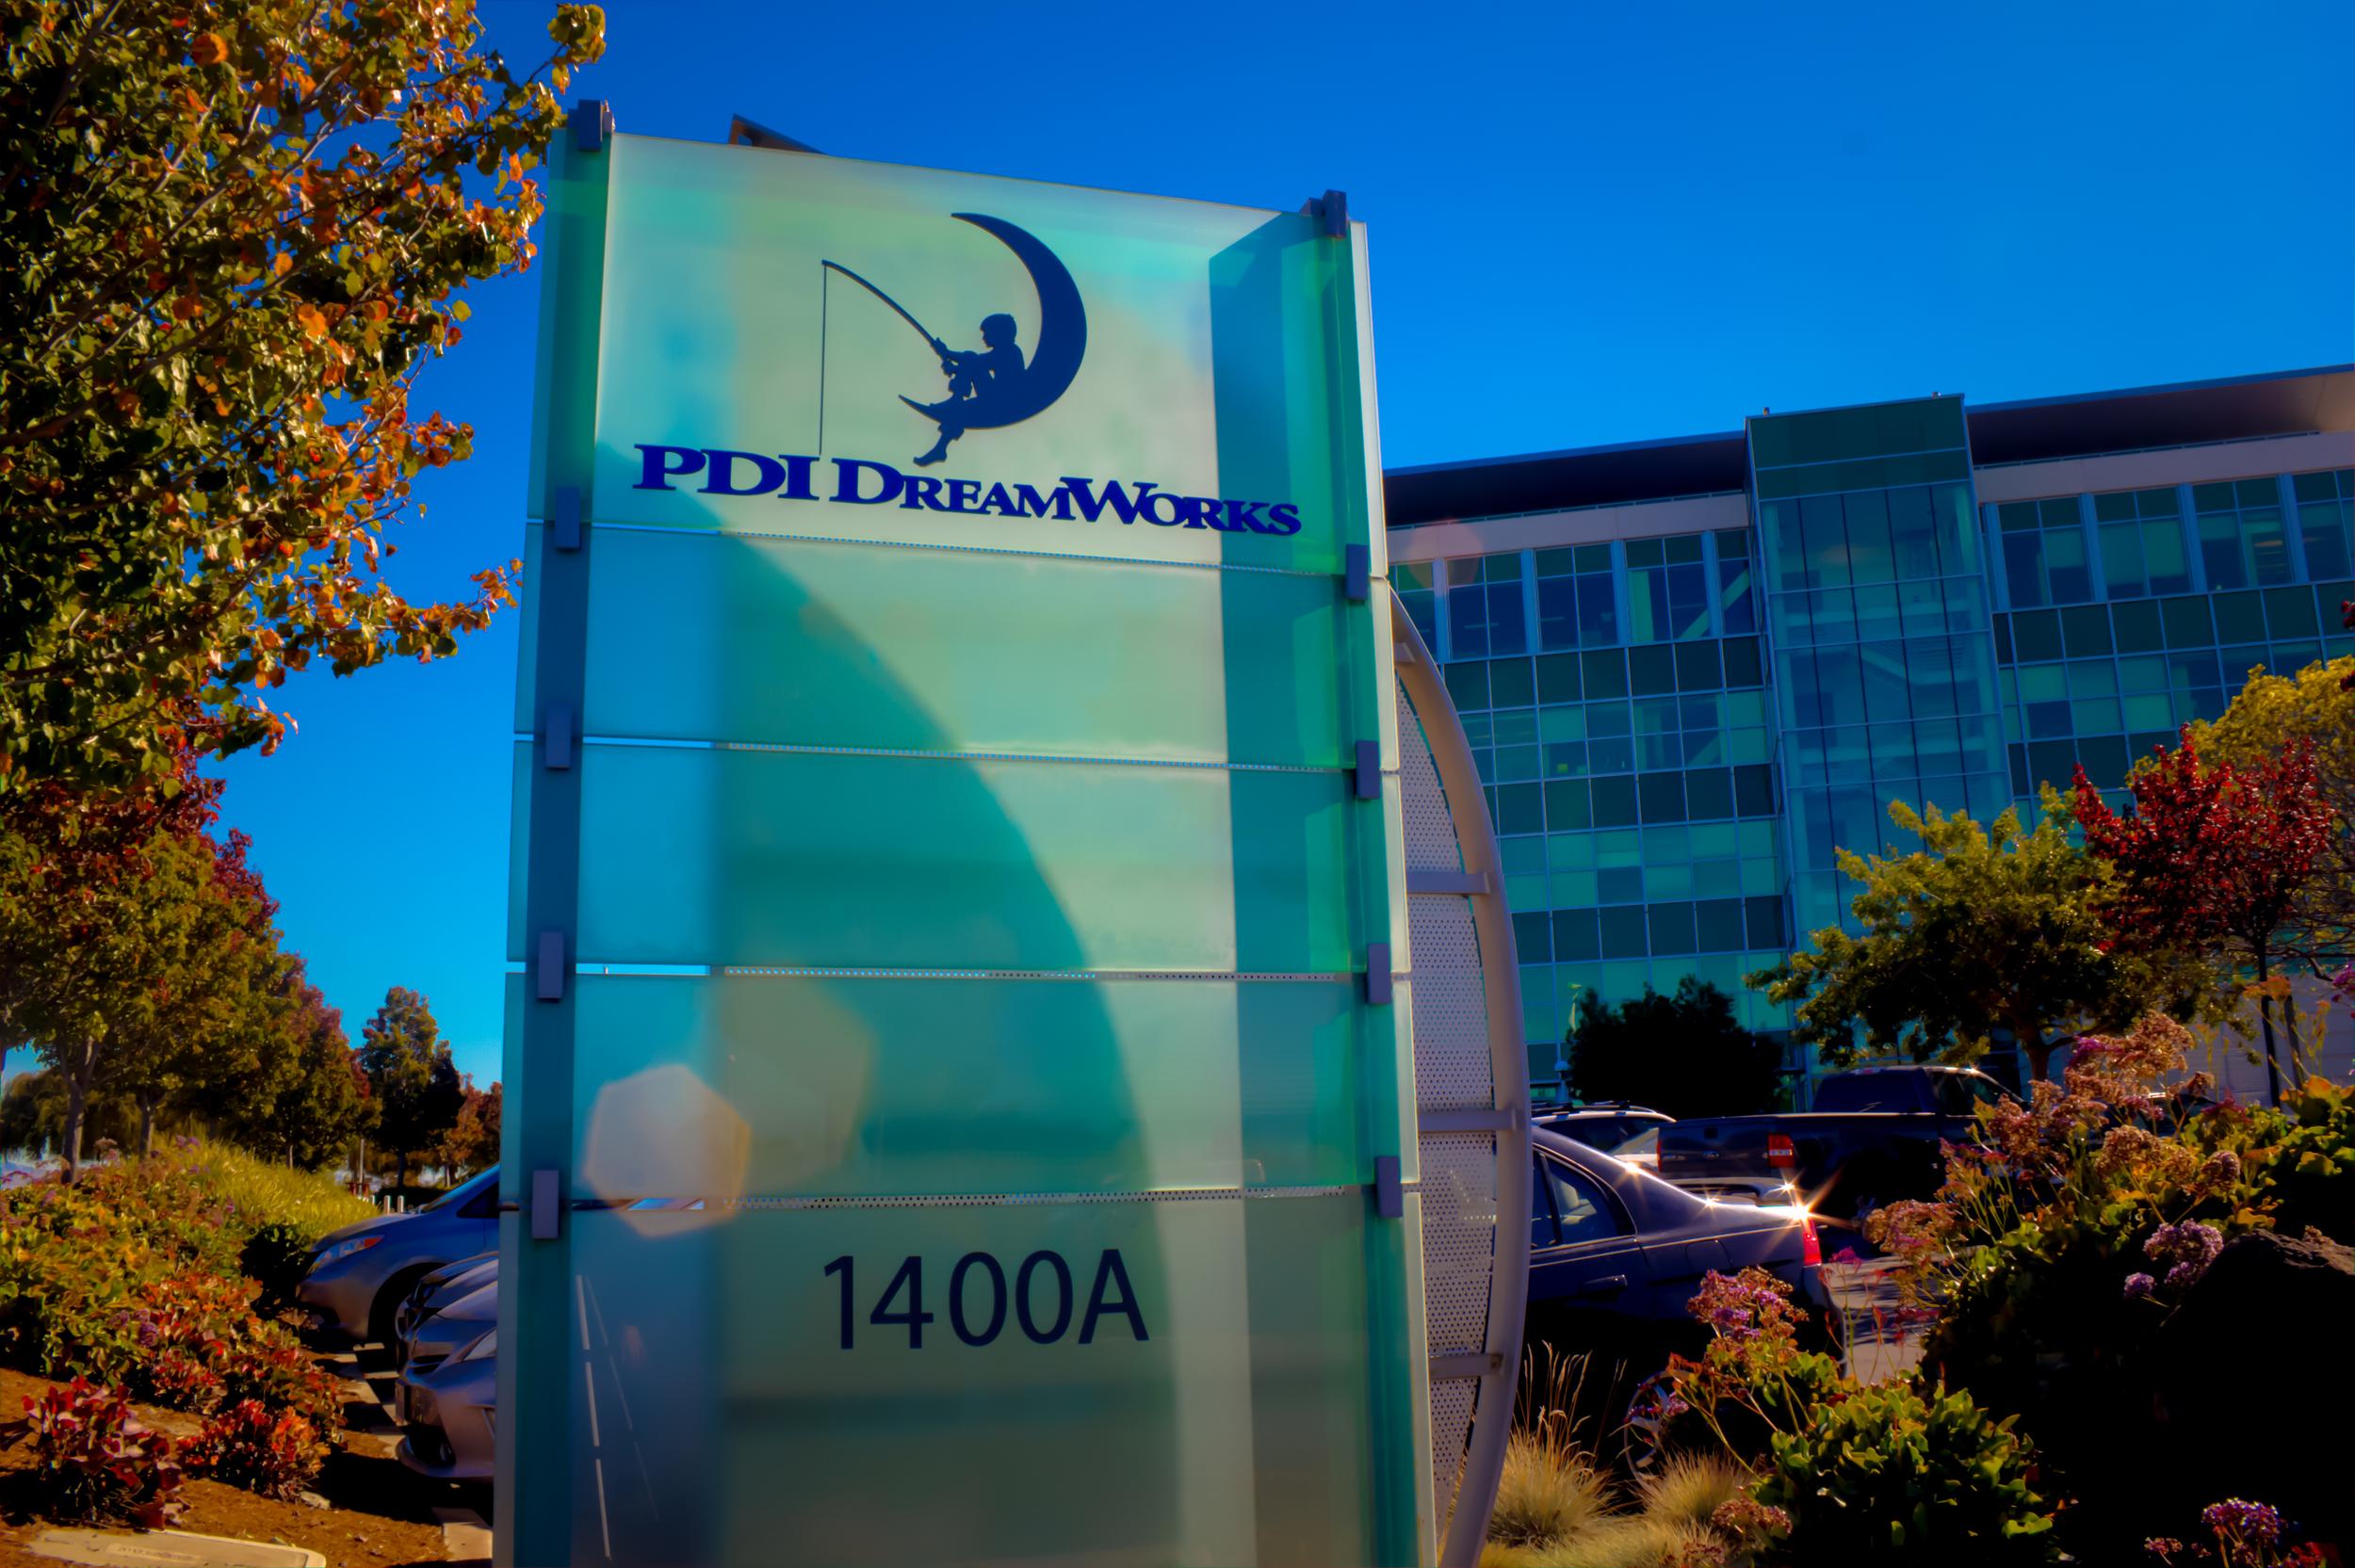 PDI/DreamWorks Animation Studio's Sign